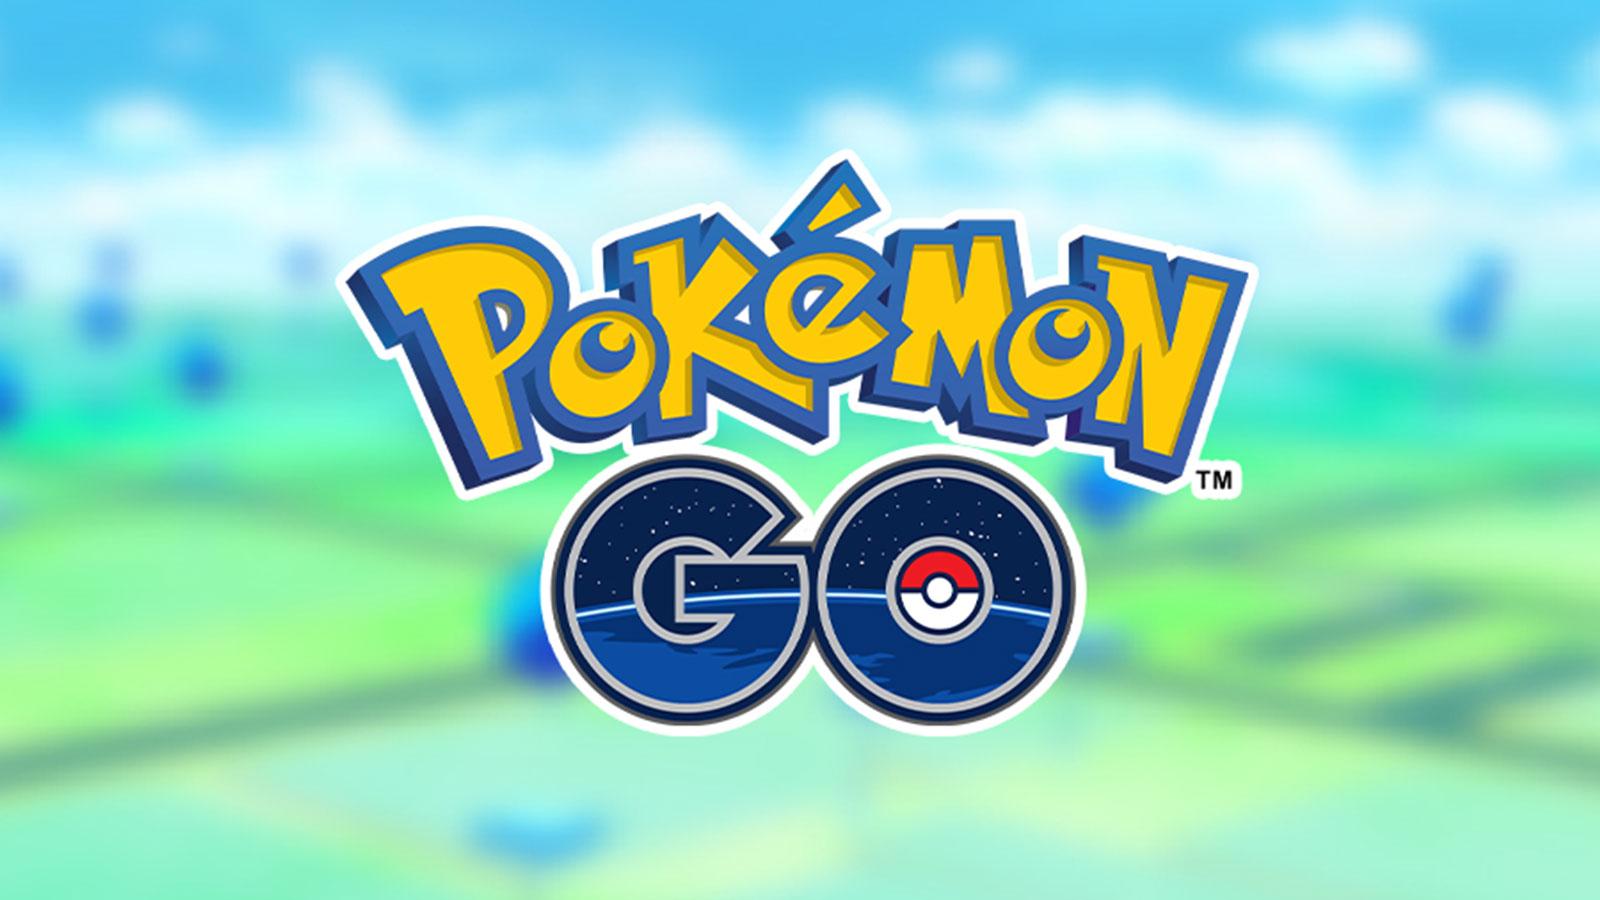 Pokémon Go Live